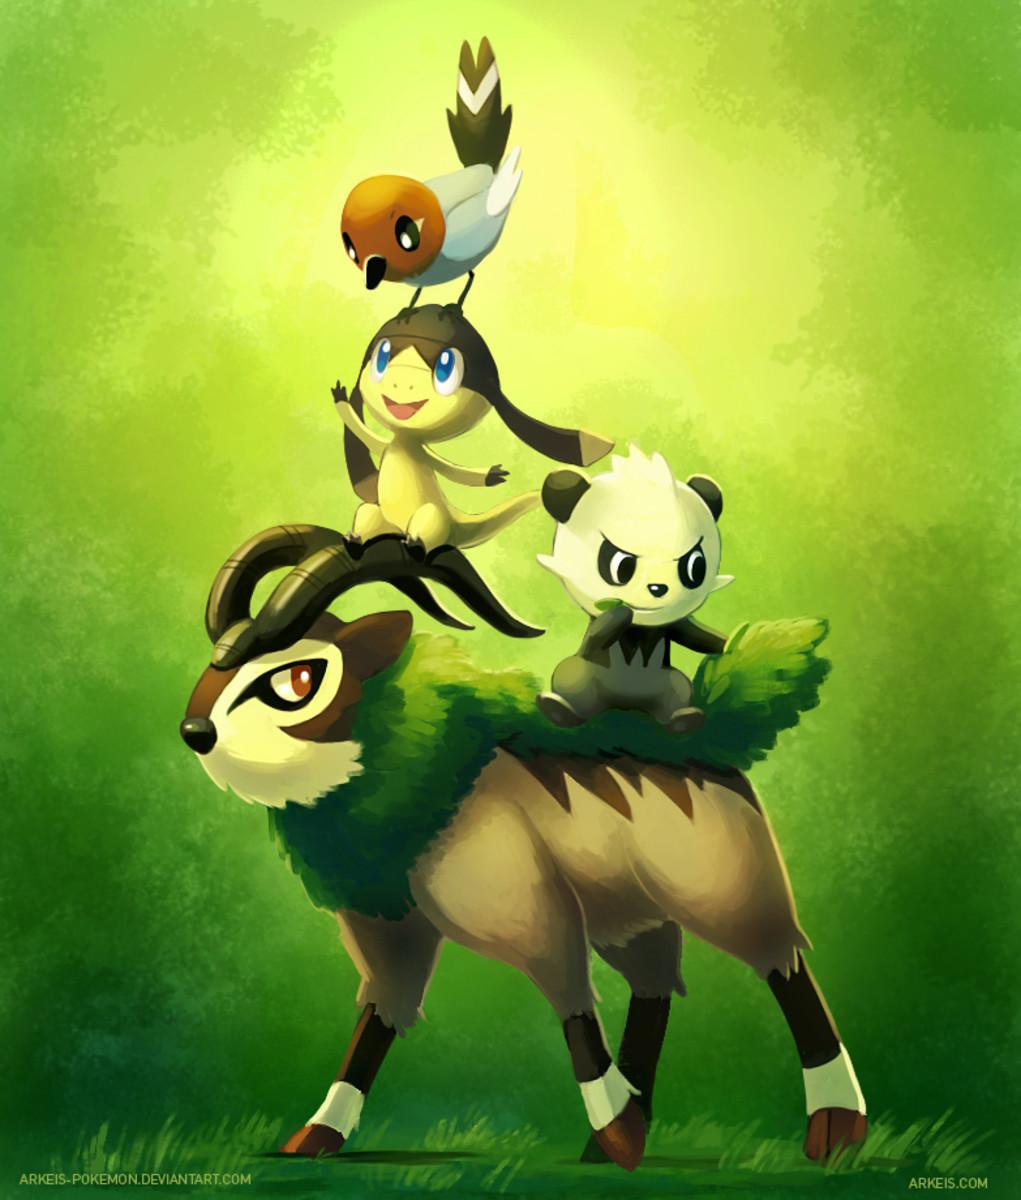 Generation 6 Pokémon